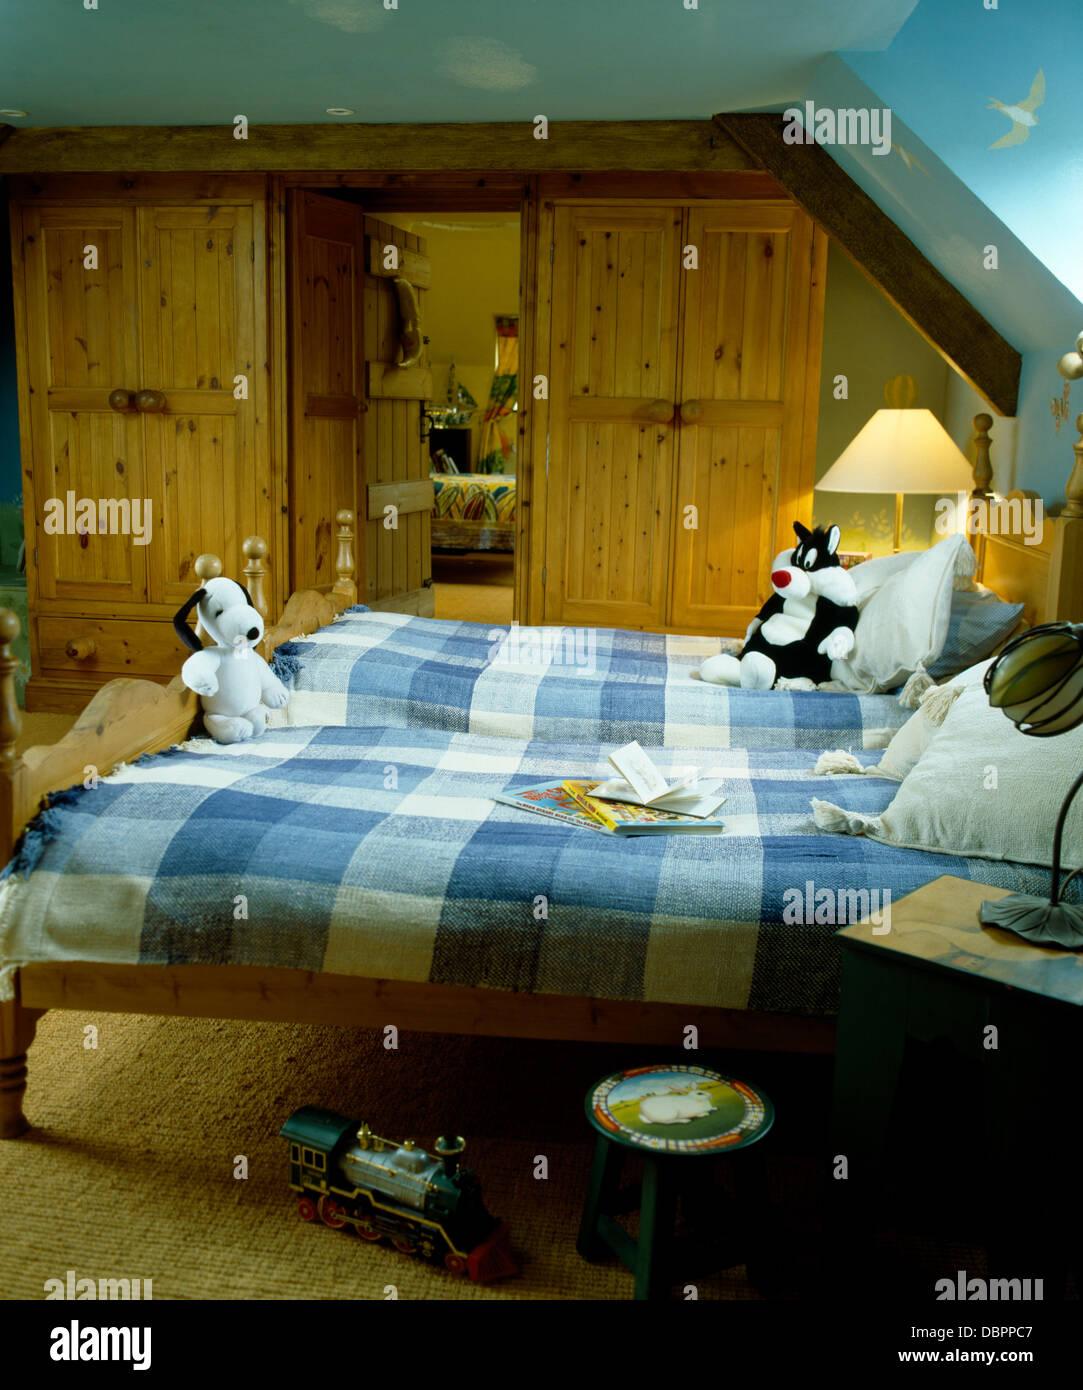 Beds For Attic Rooms Loft Space Interior Design Ideas